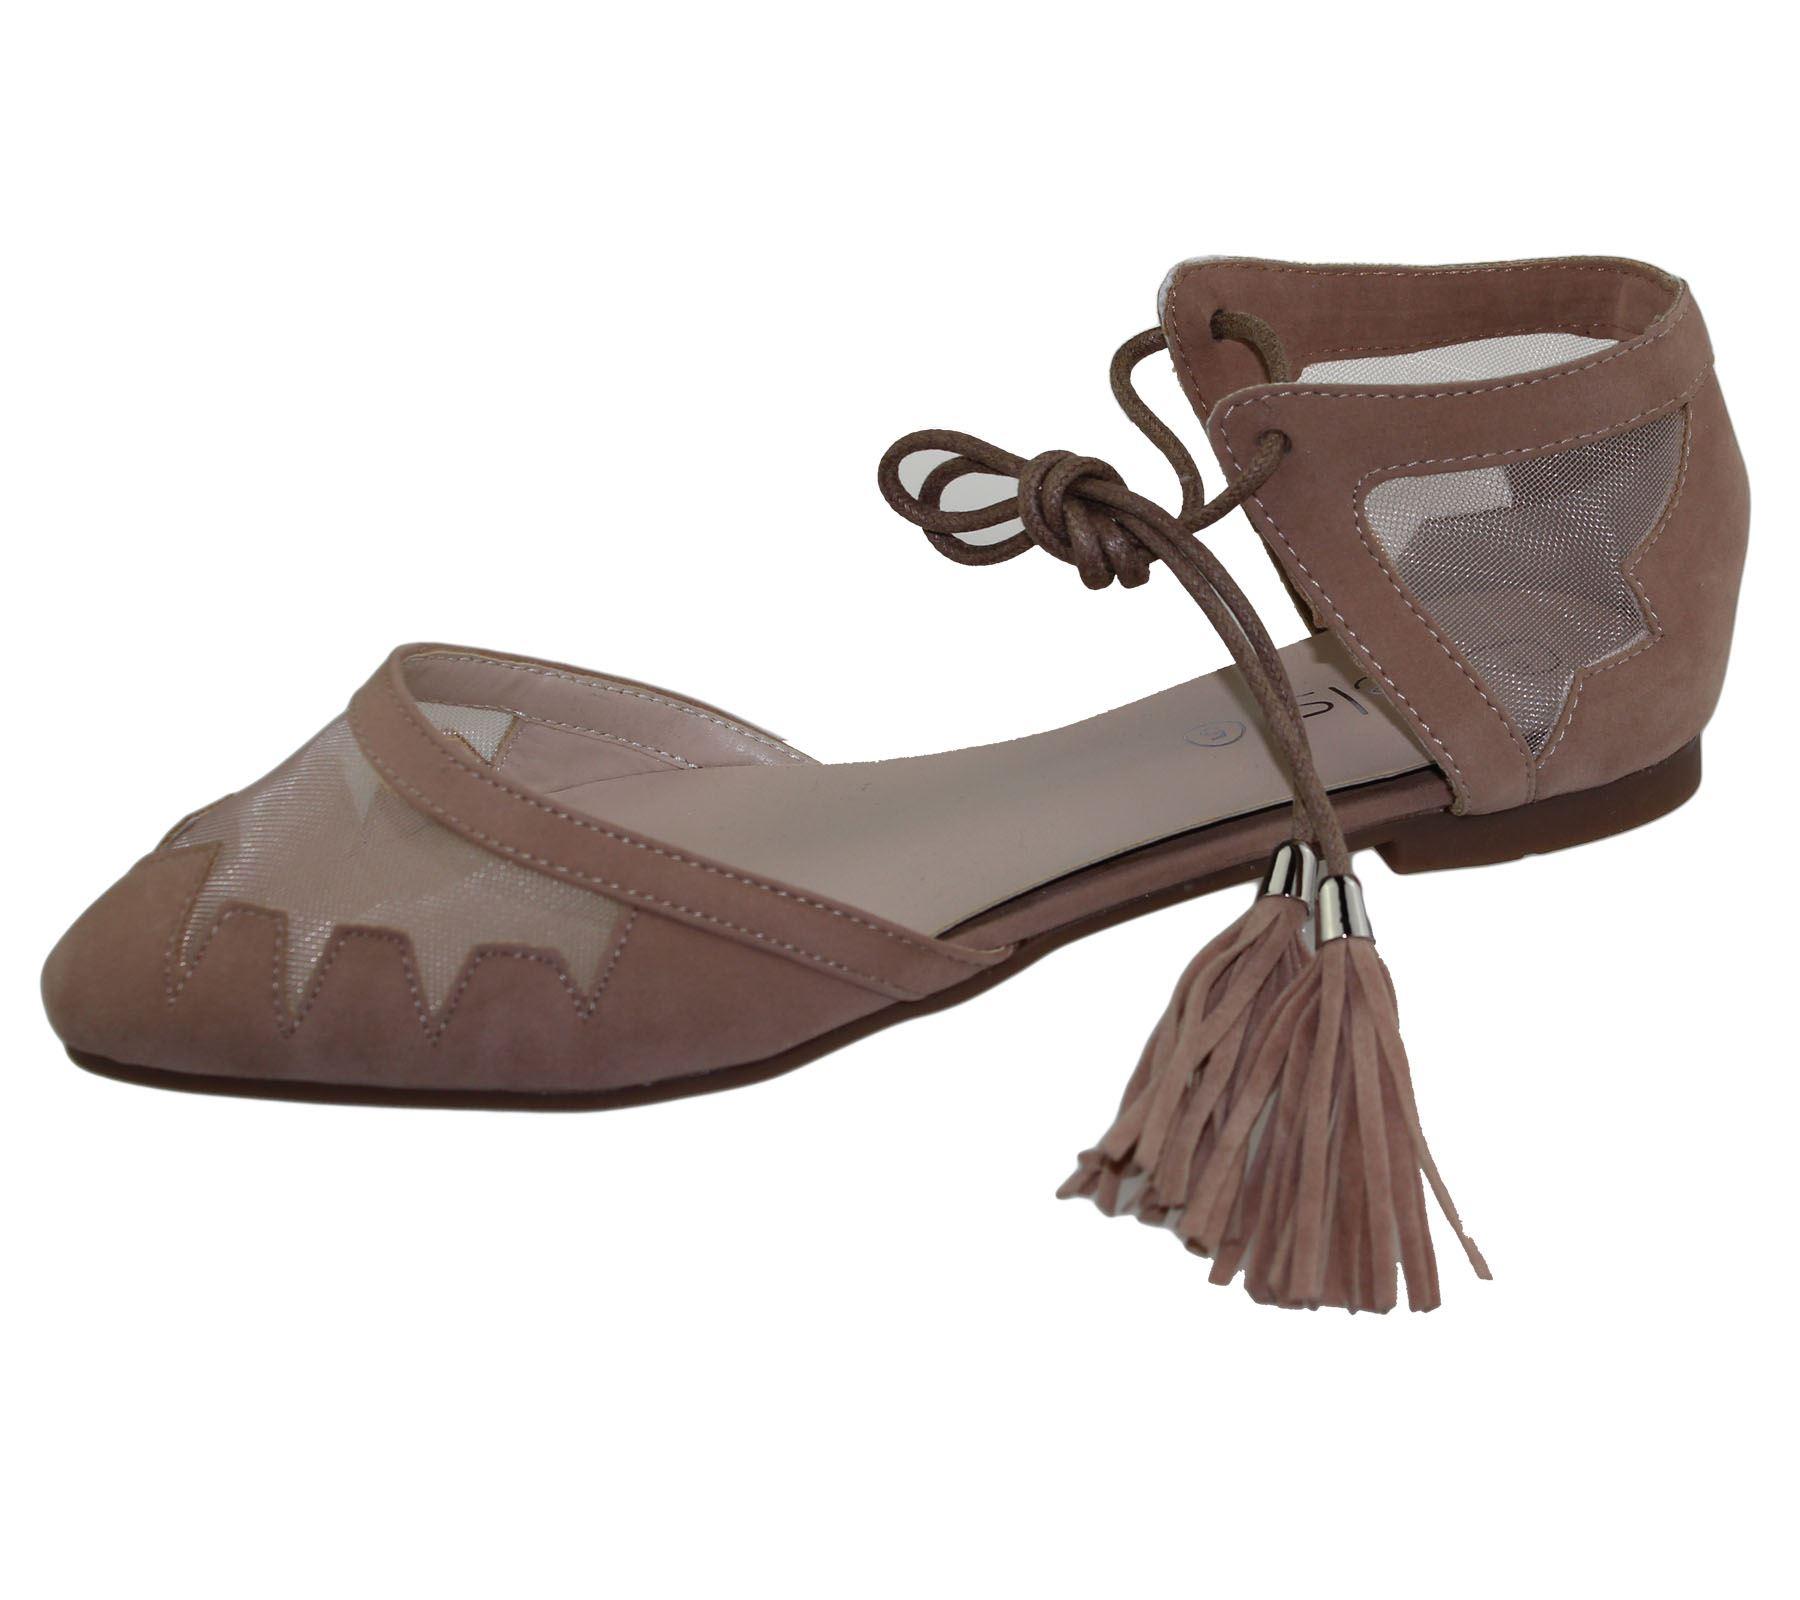 Womens-Flat-Ballerina-Dolly-Pumps-Ballet-Ladies-Summer-Mesh-Tassel-Shoes-Sandals thumbnail 26